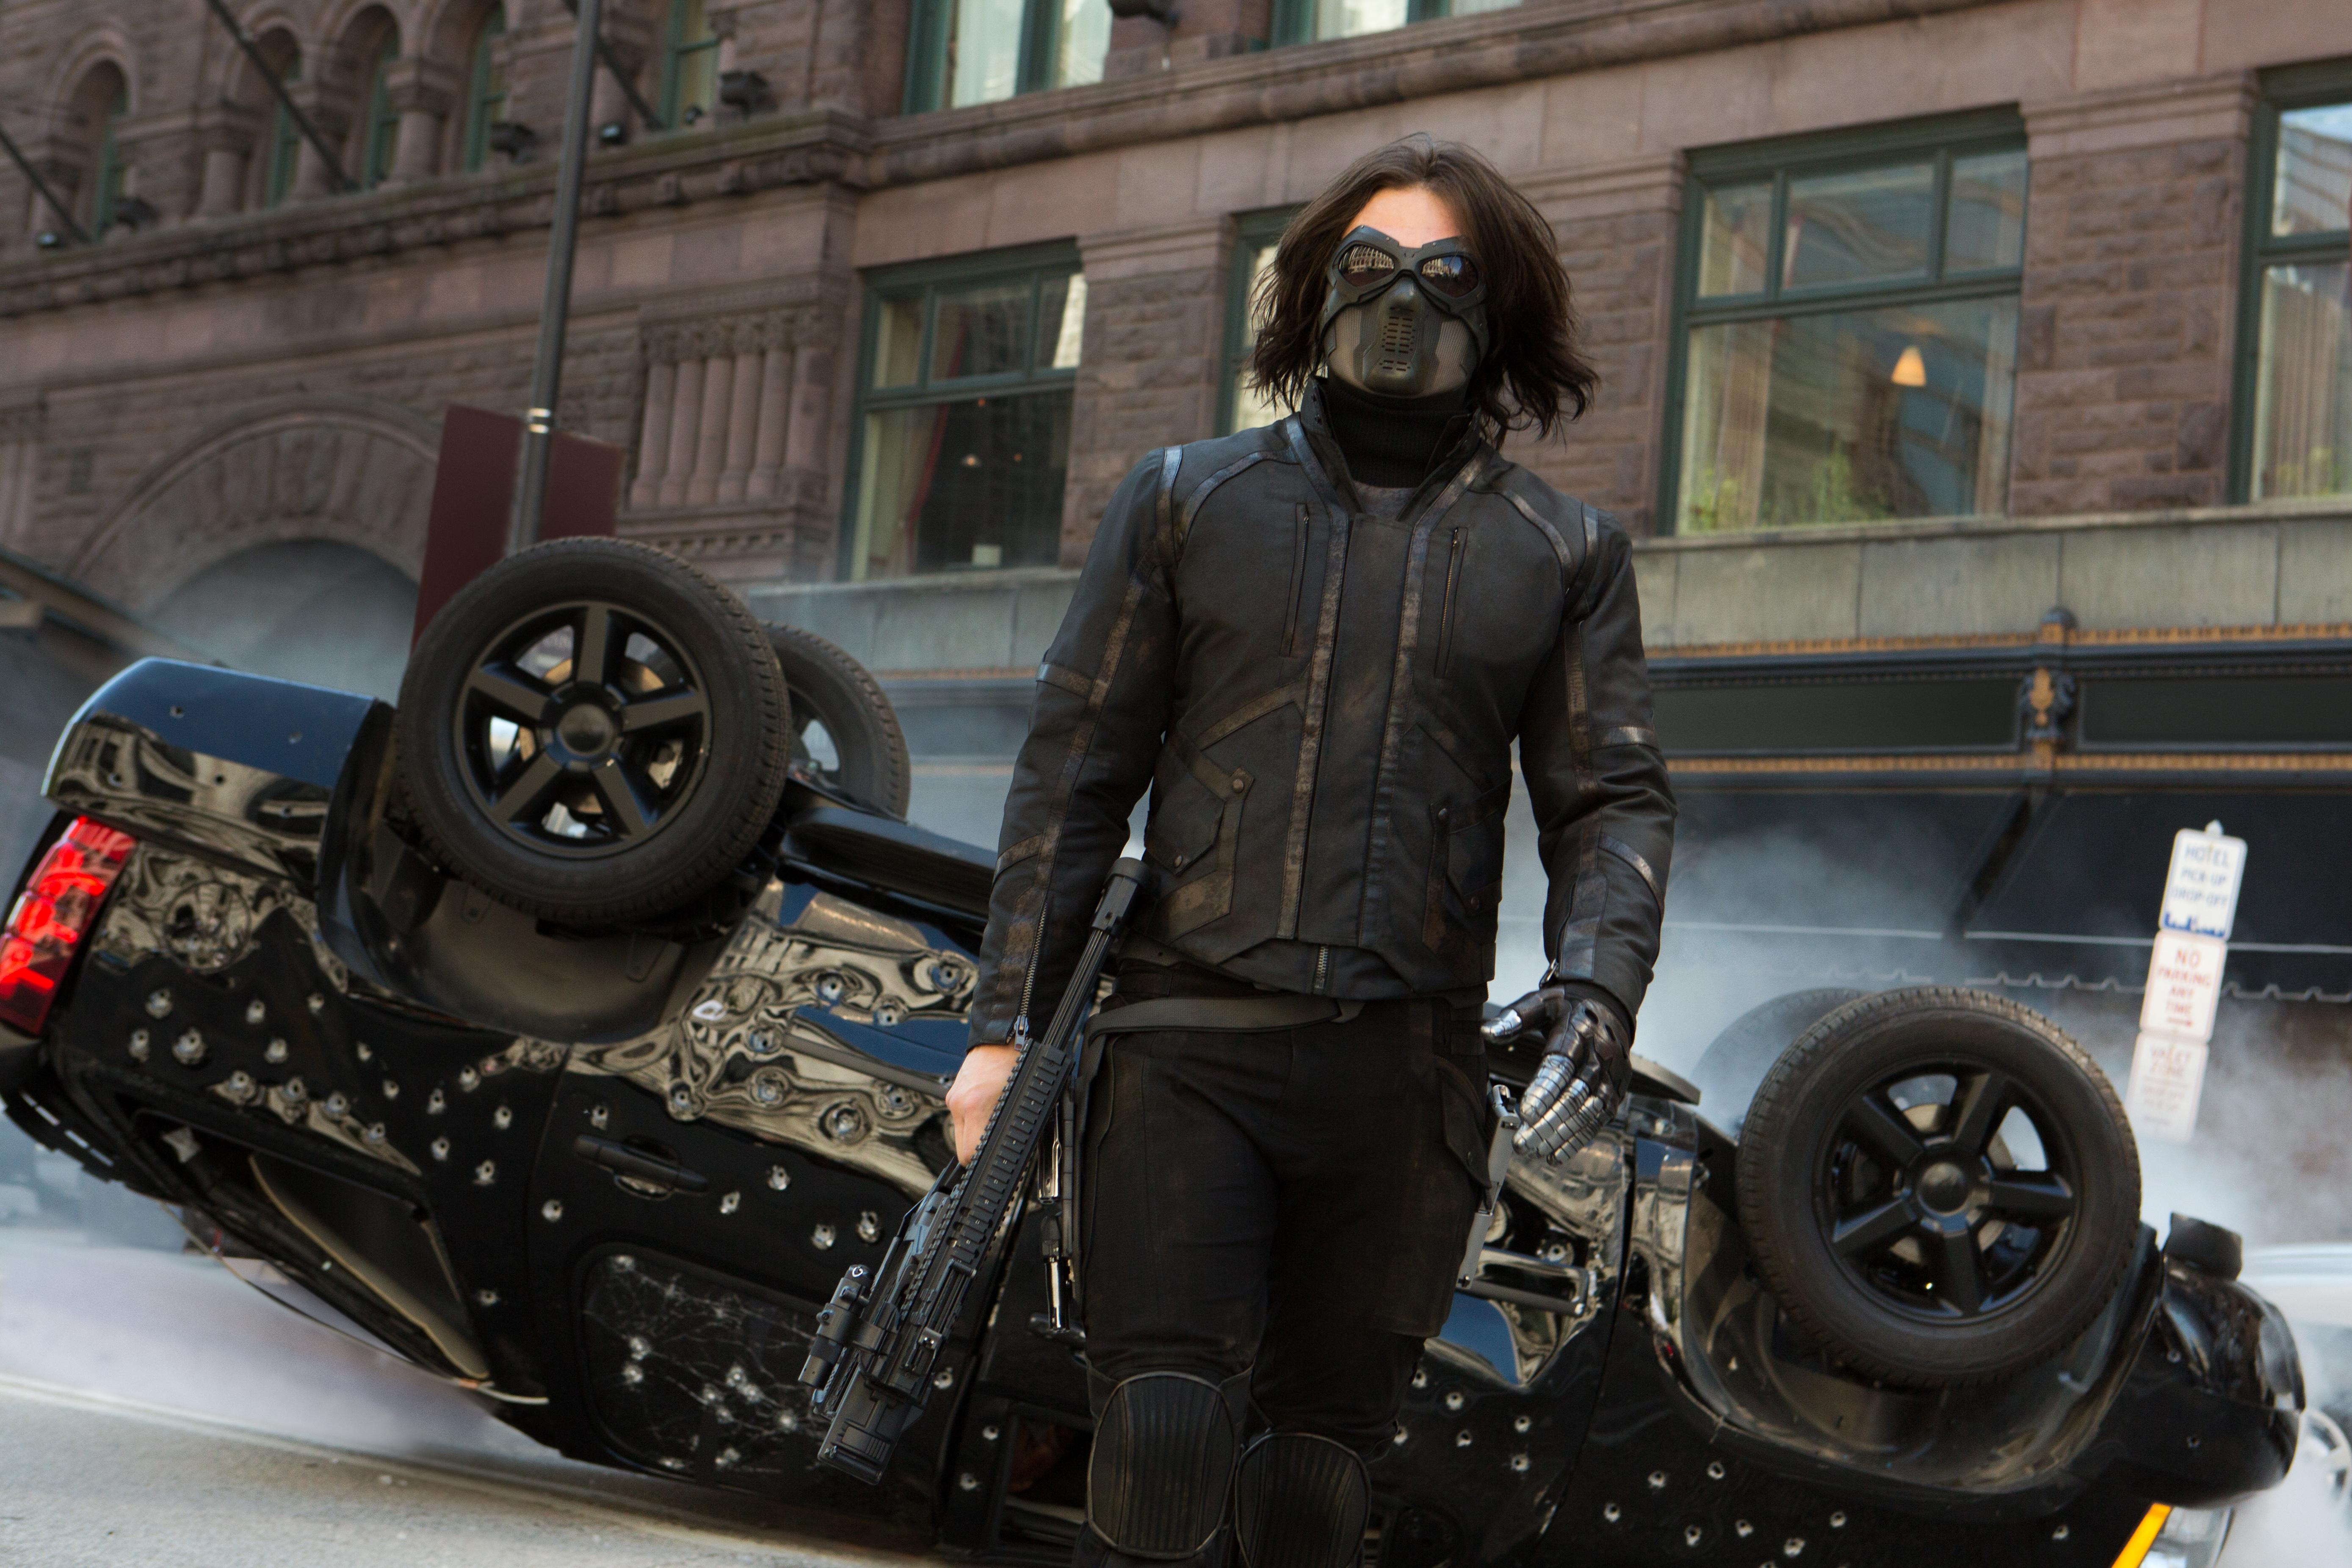 Attack on Nick Fury | Marvel Cinematic Universe Wiki | Fandom